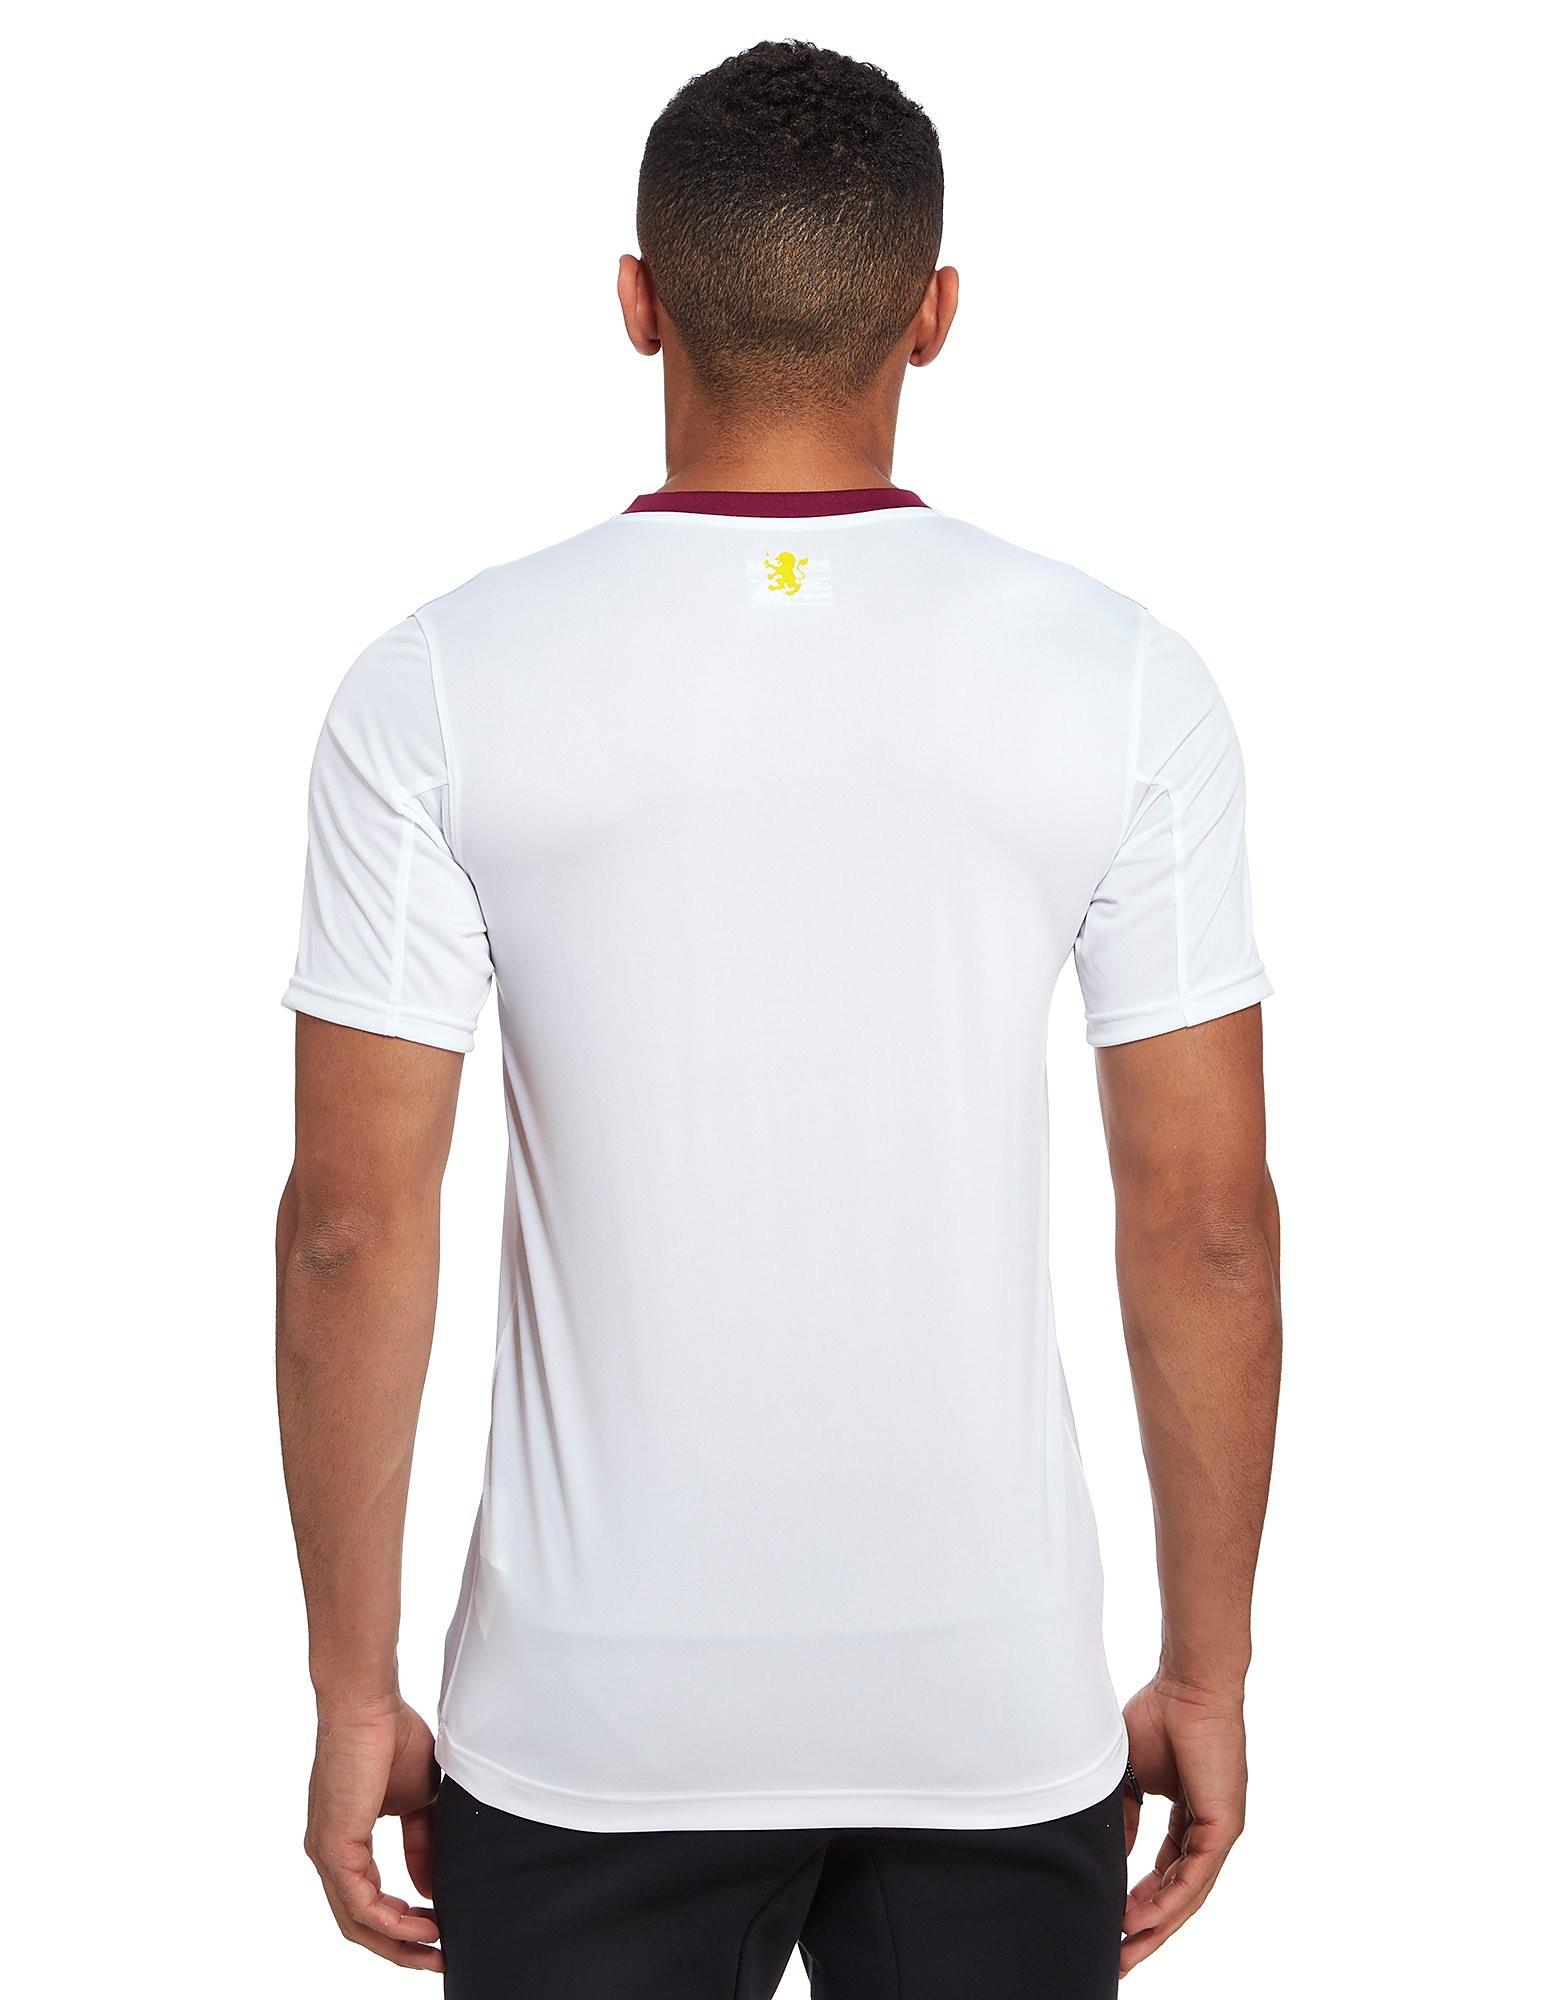 Under Armour Aston Villa FC 2016/17 Away Shirt